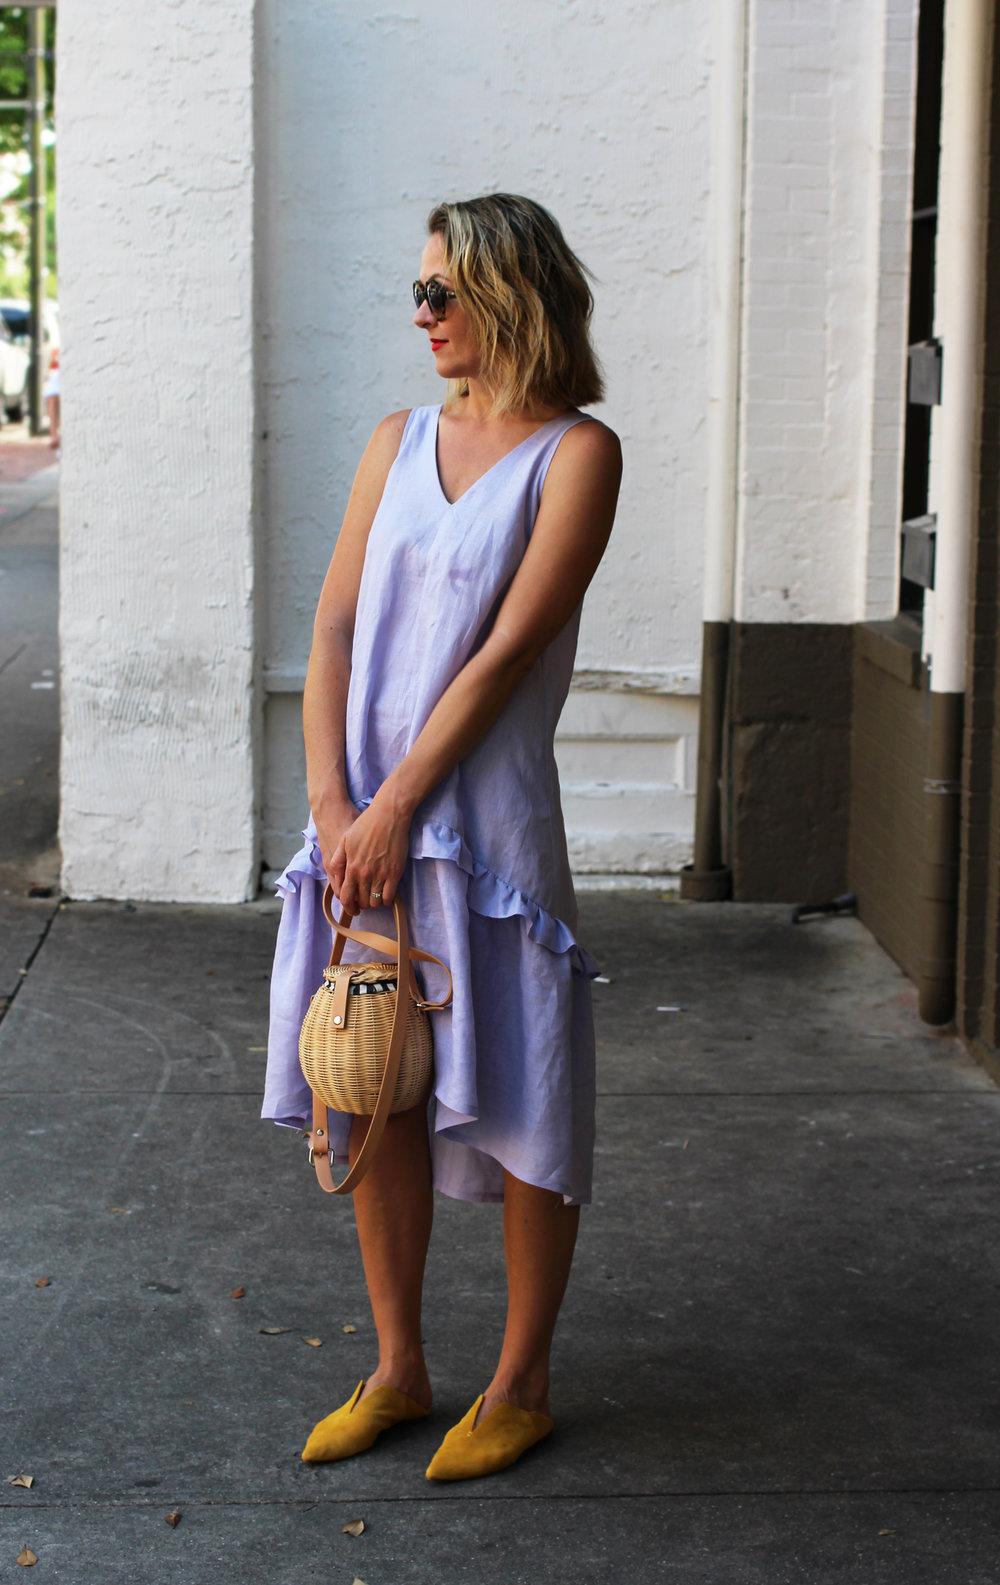 lilac dress1.JPG